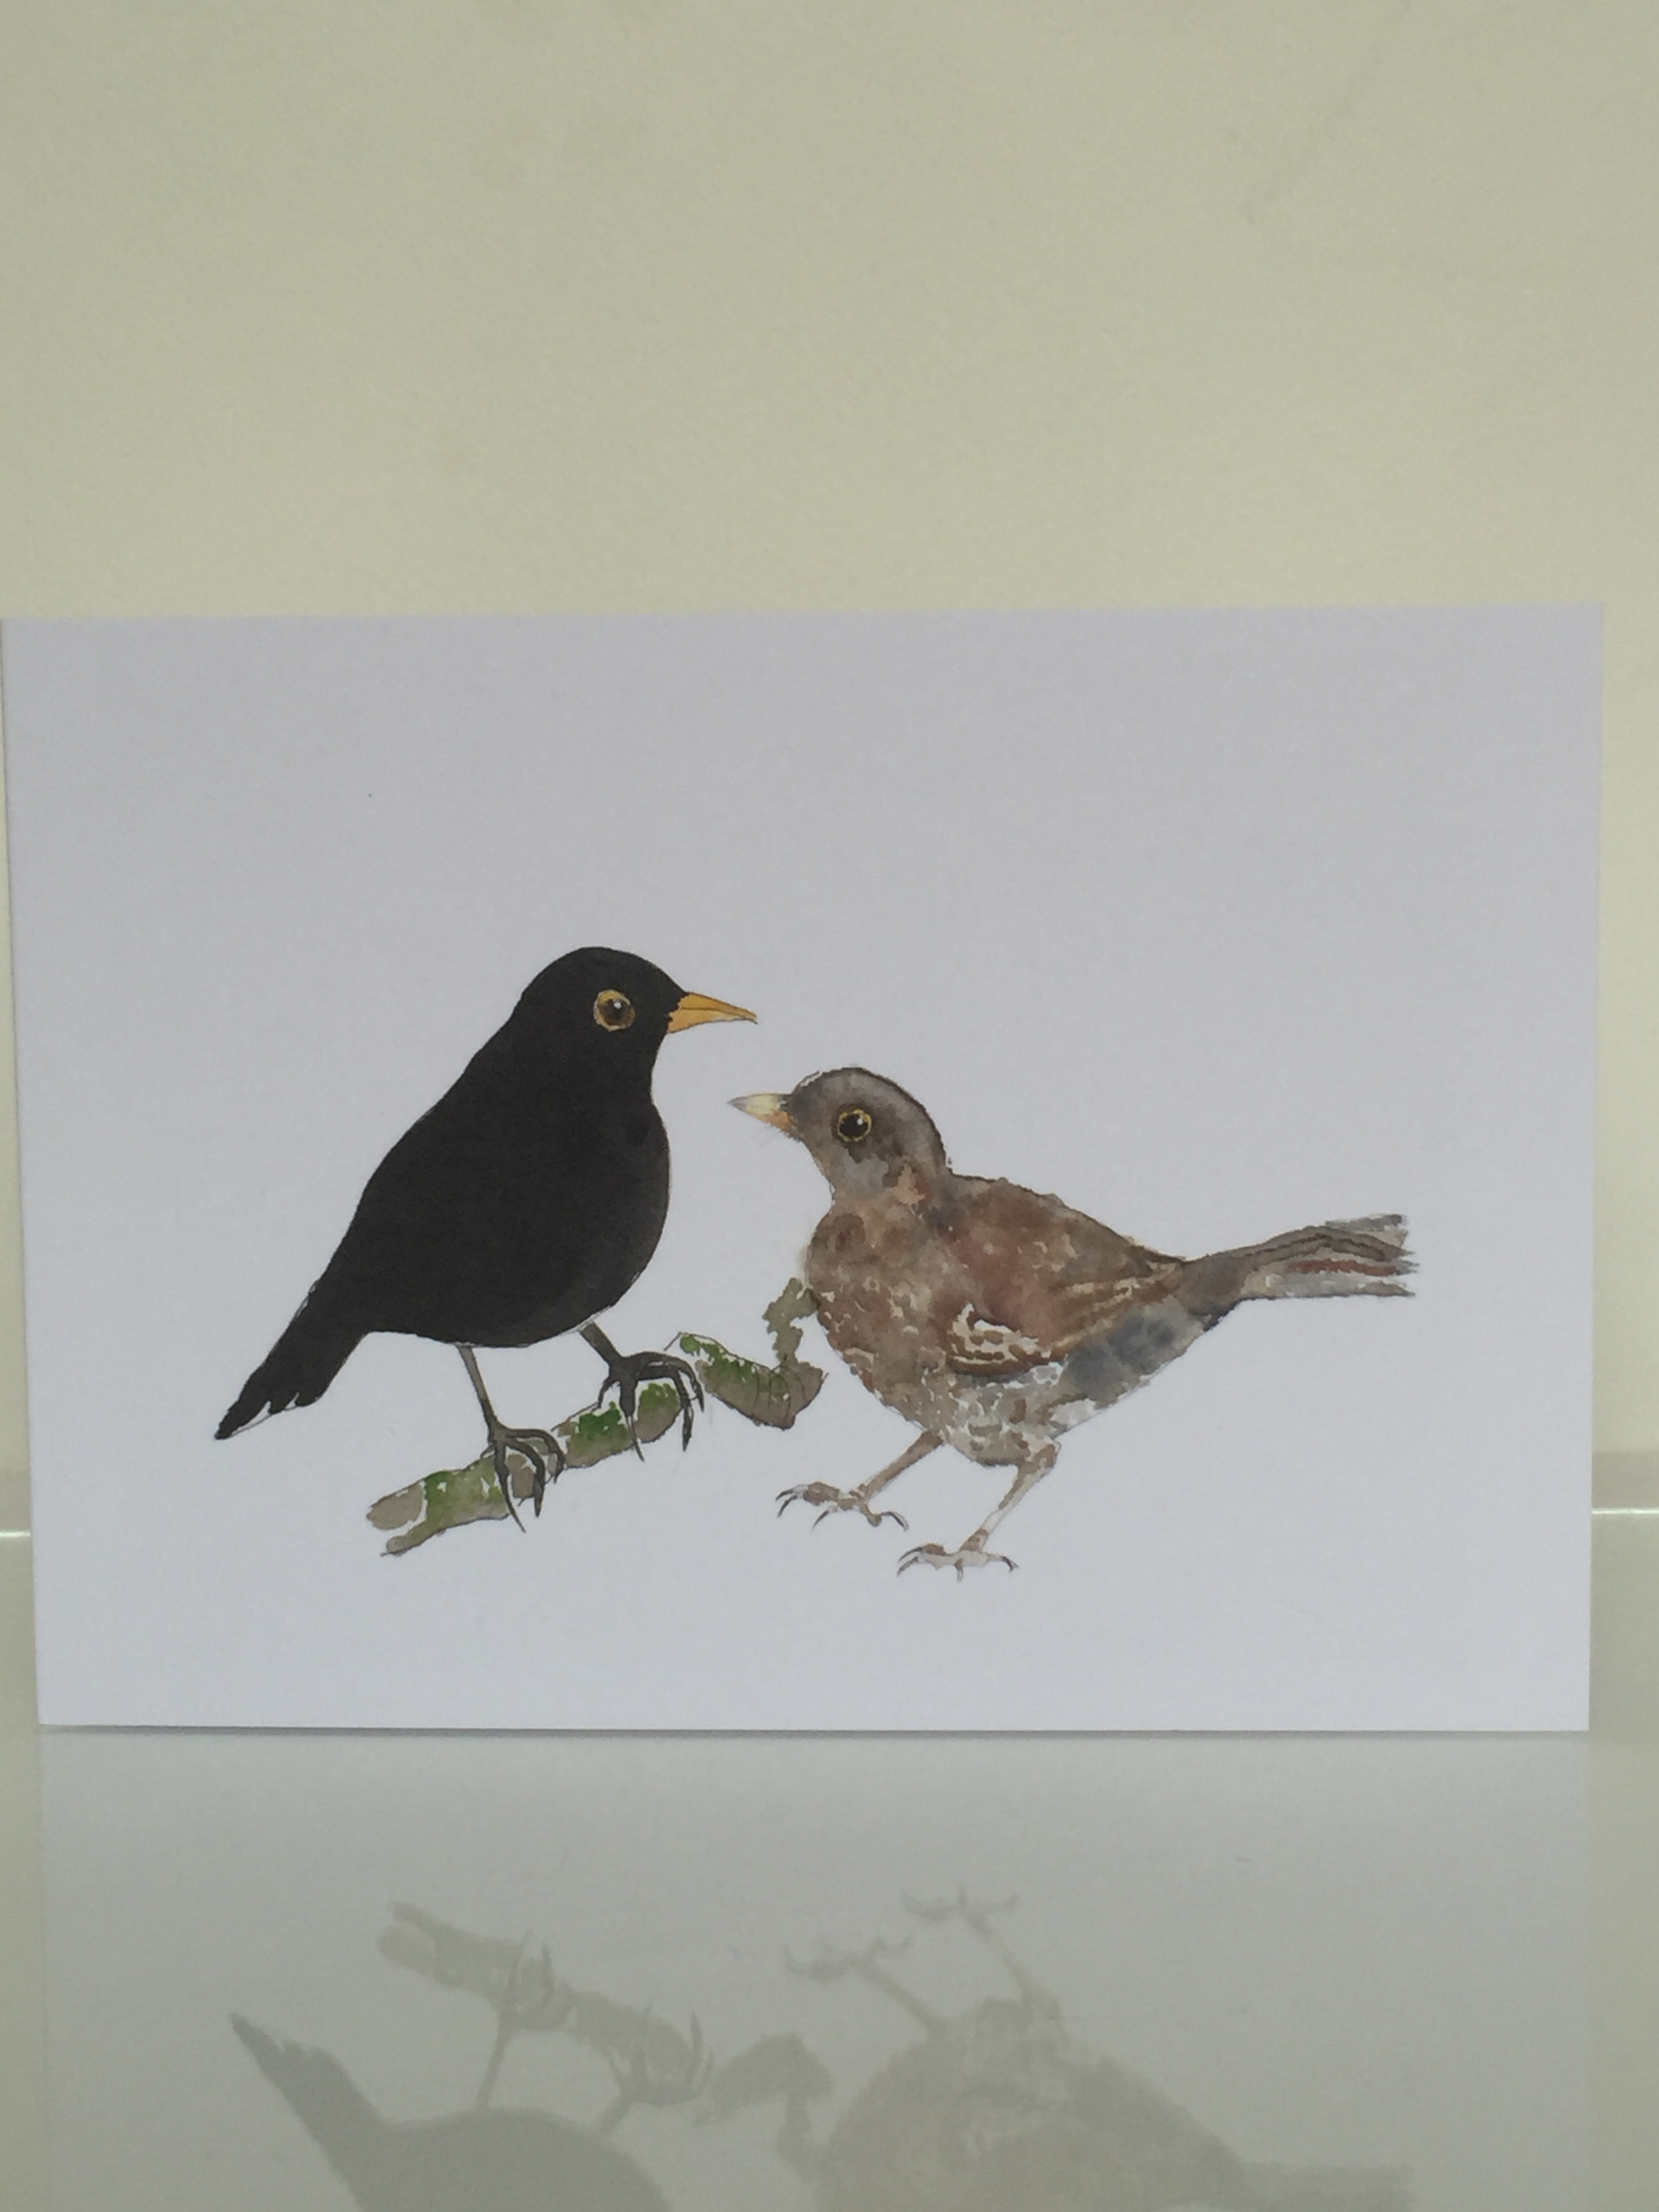 Pair of blackbirds